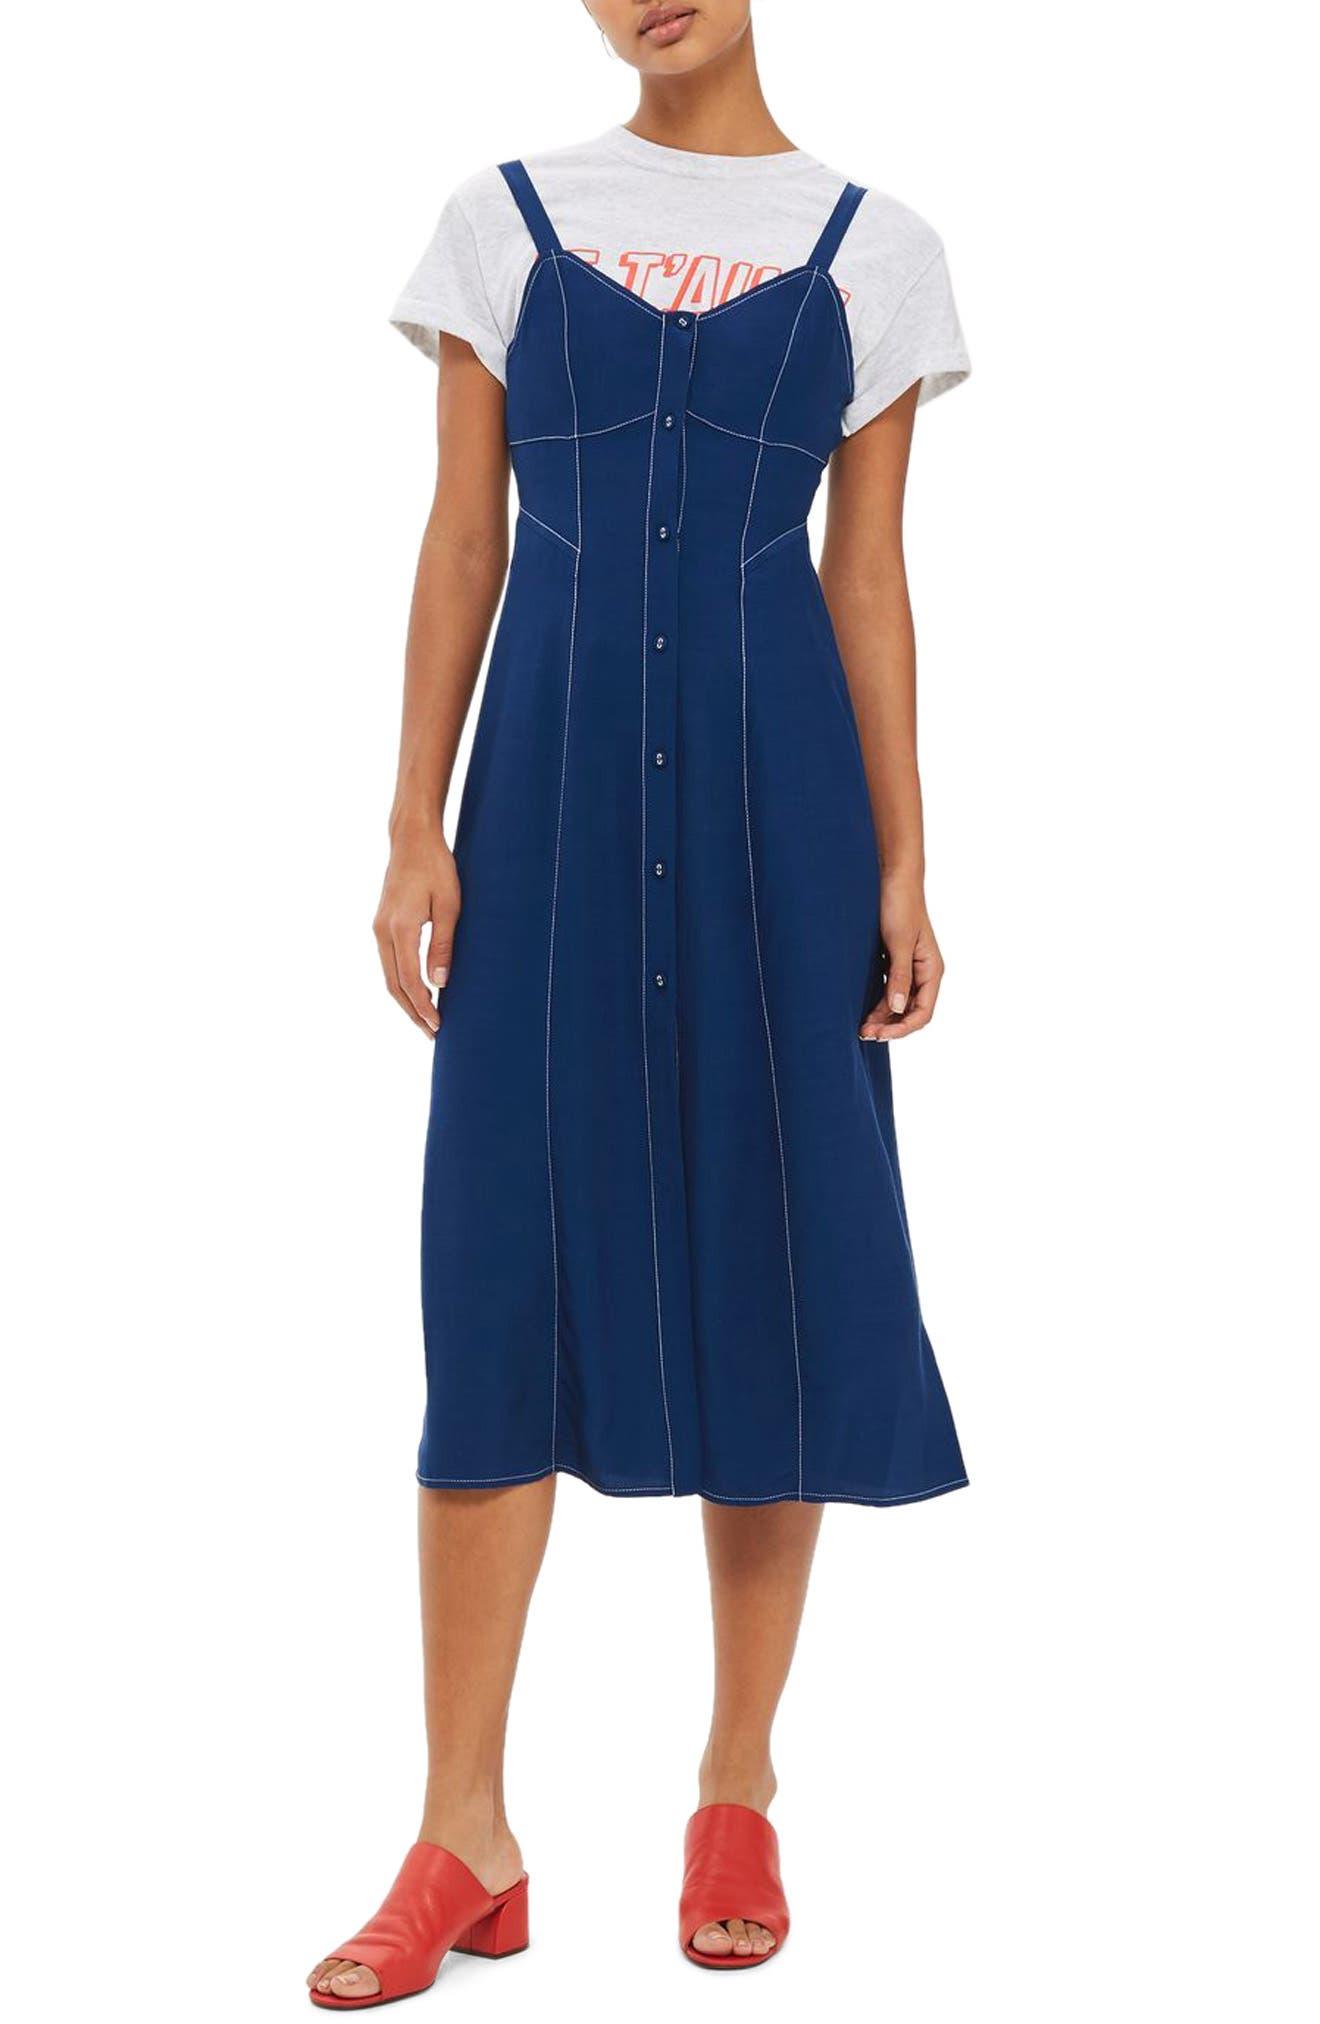 Main Image - Topshop Topstitch Corset Midi Dress